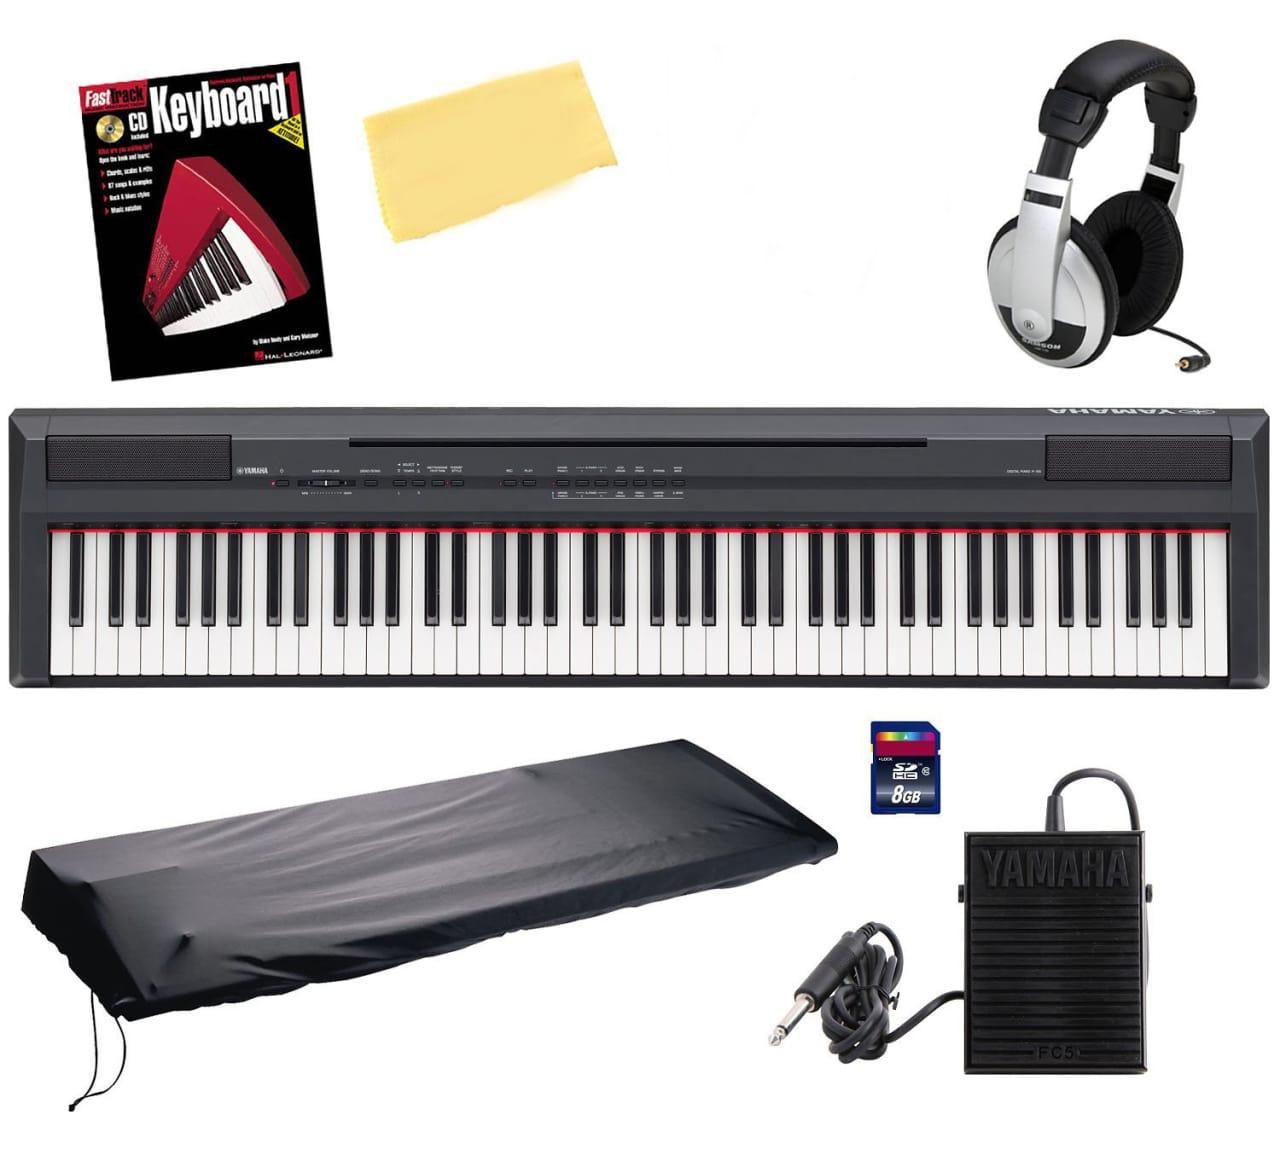 yamaha p105b digital piano review